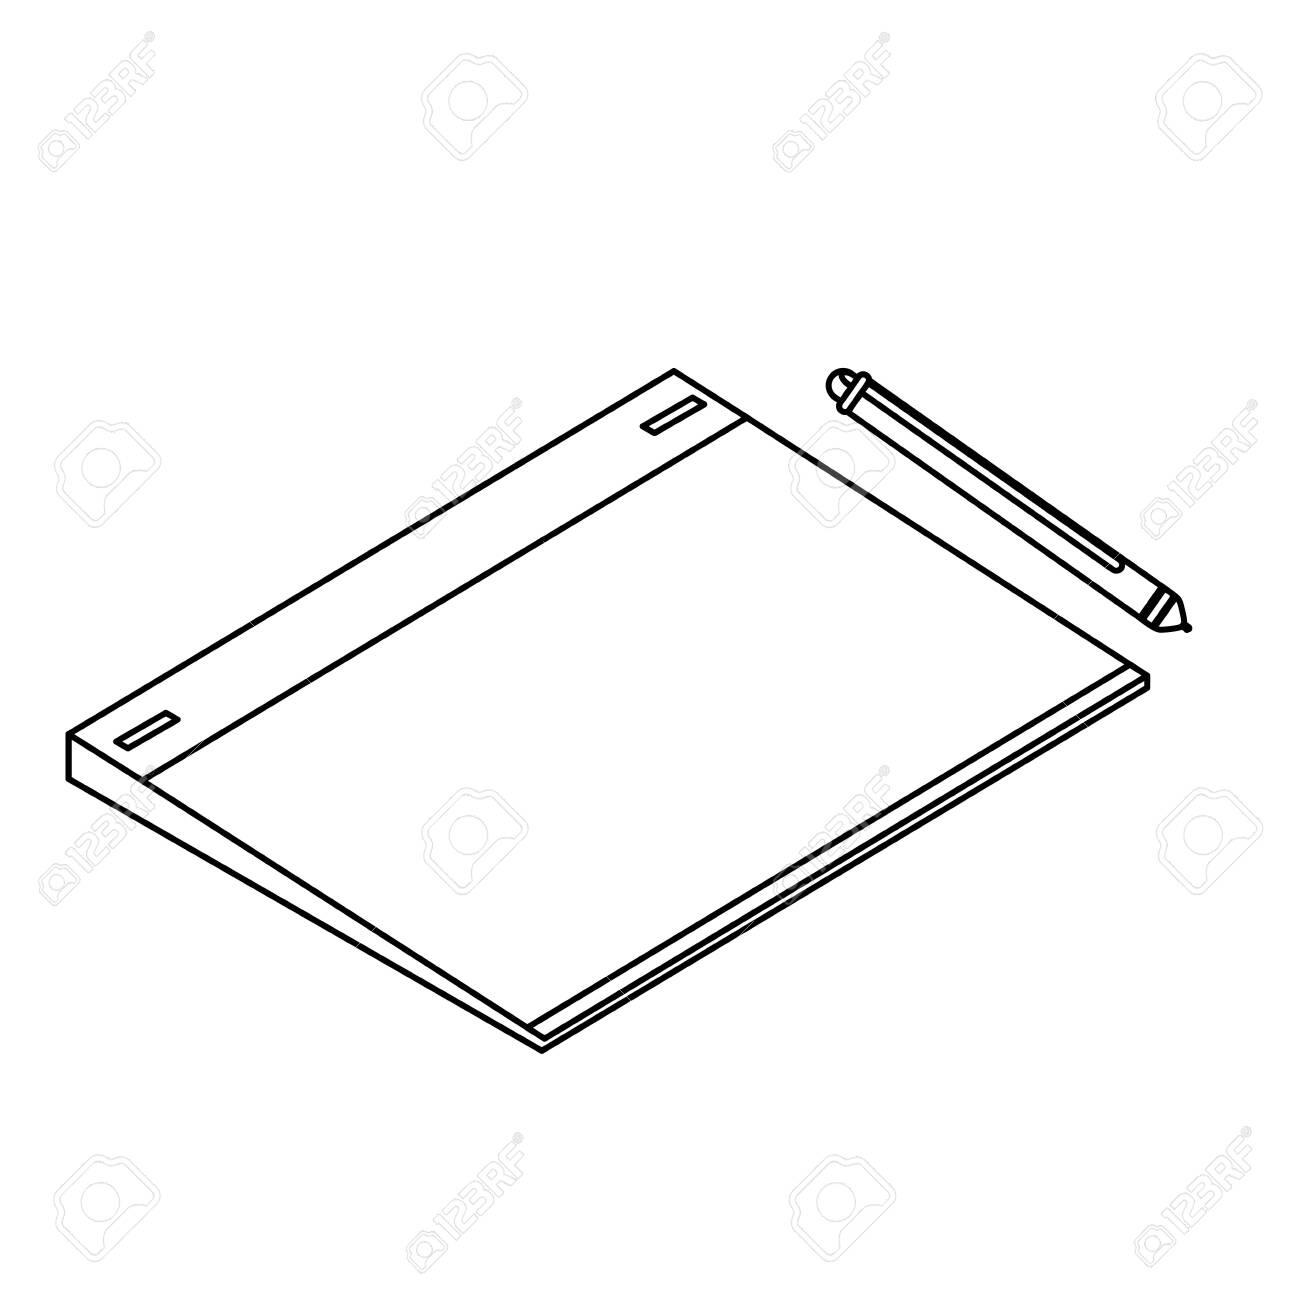 graphic design board and pencil electronics vector illustration design - 124060701